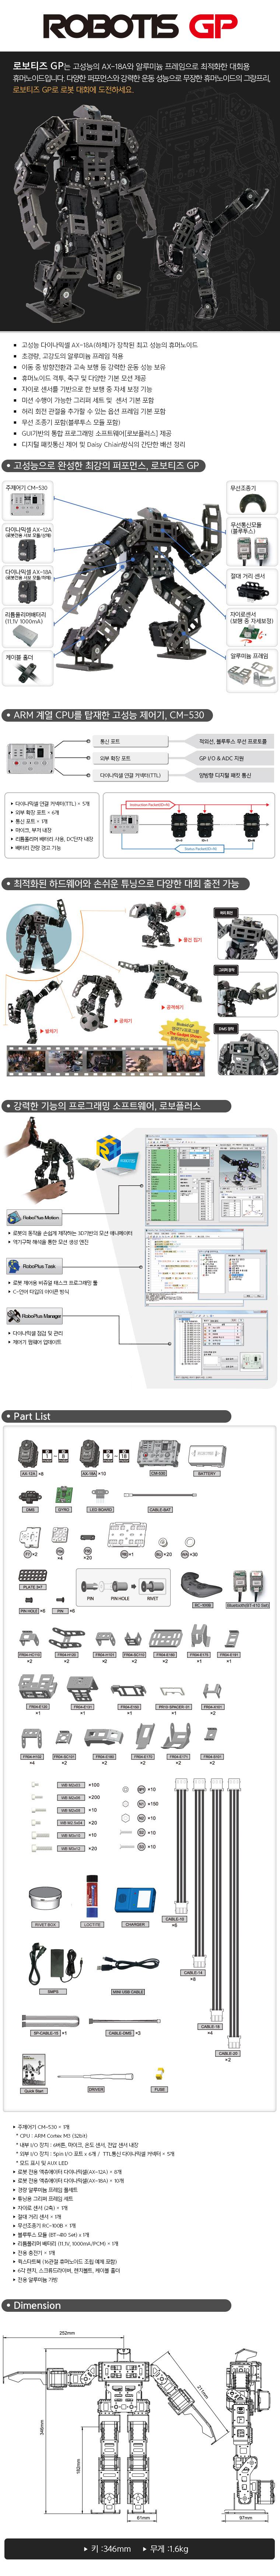 ROBOTIS_GP_KO_shop_ver1719.jpg